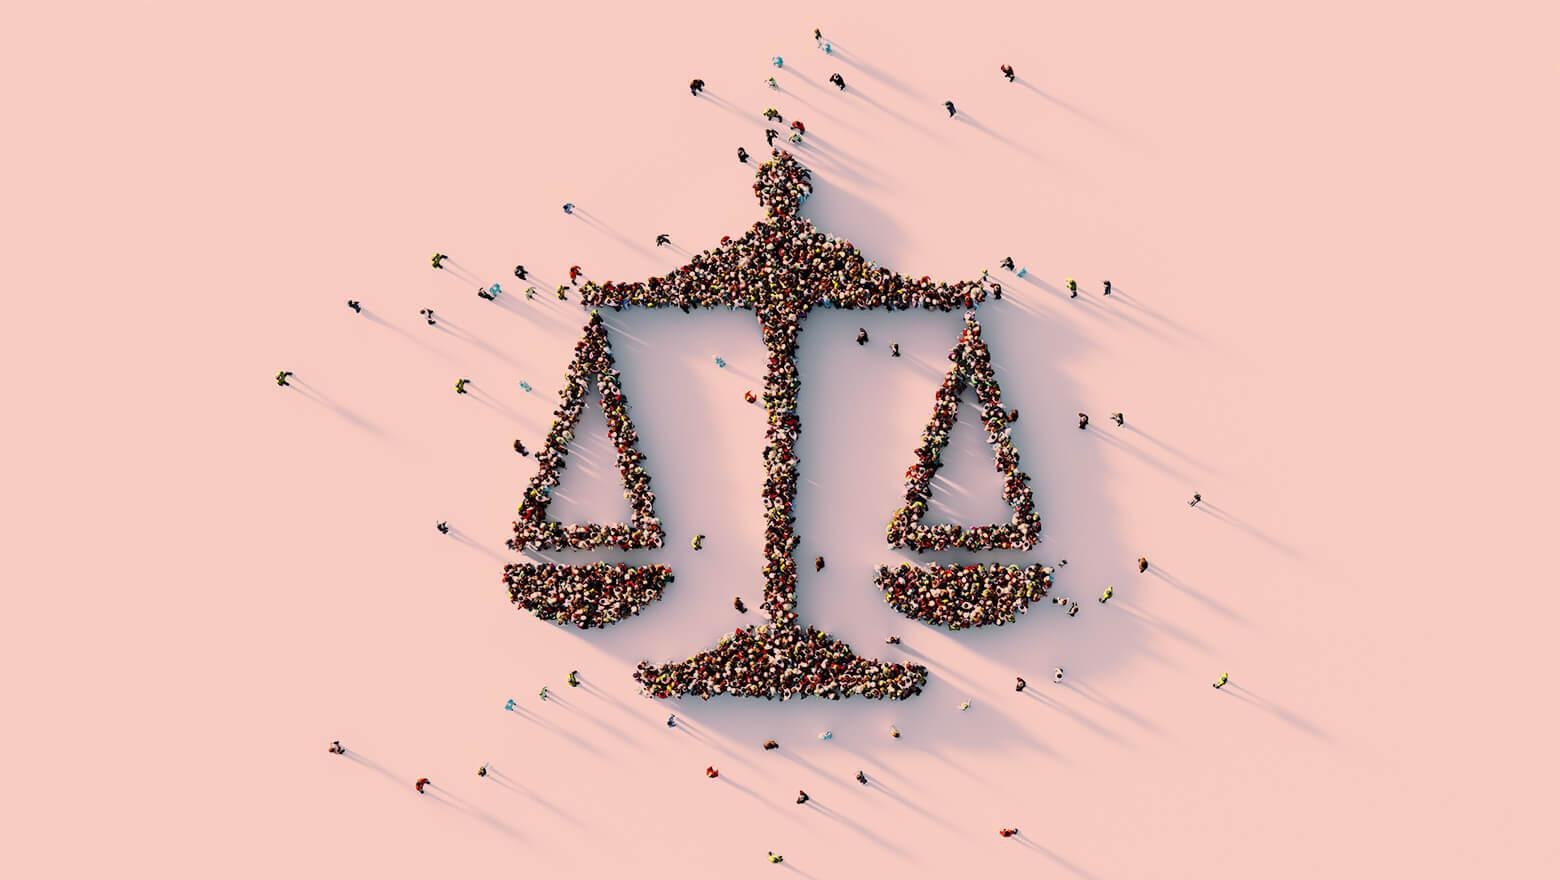 How to Apply to Law School | SoFi